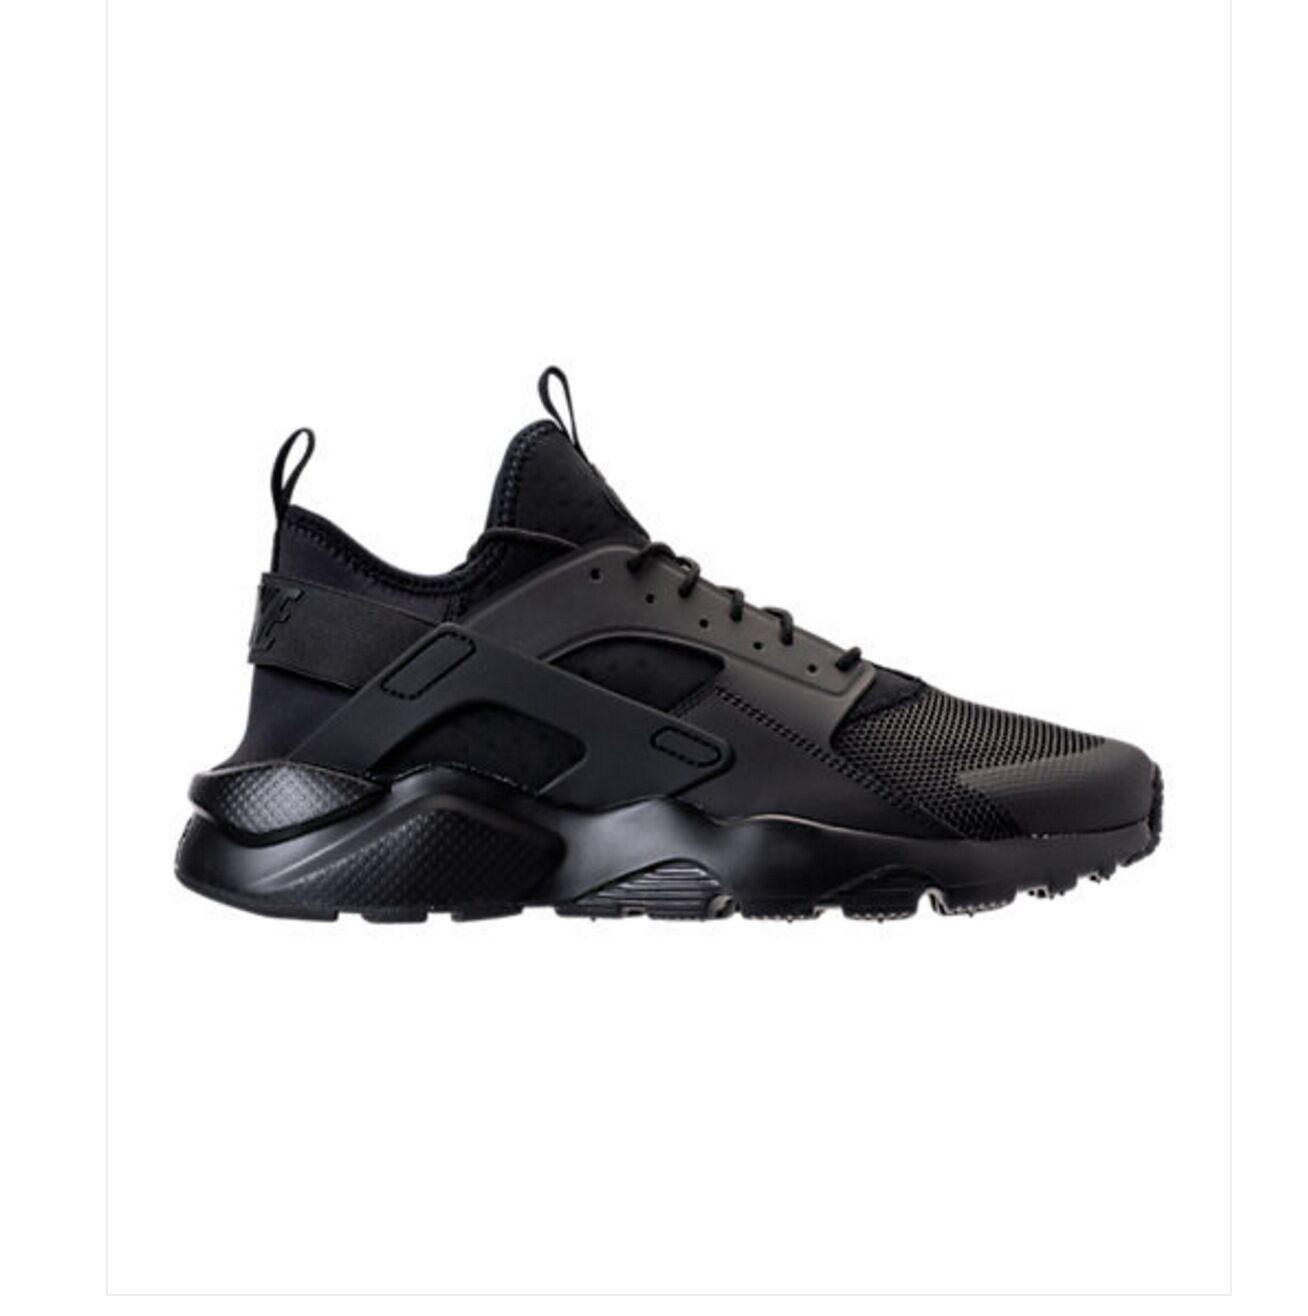 NEW NIKE AIR HUARACHE RUN ULTRA Running Shoes Triple Black Blackout 819685-002 Comfortable and good-looking